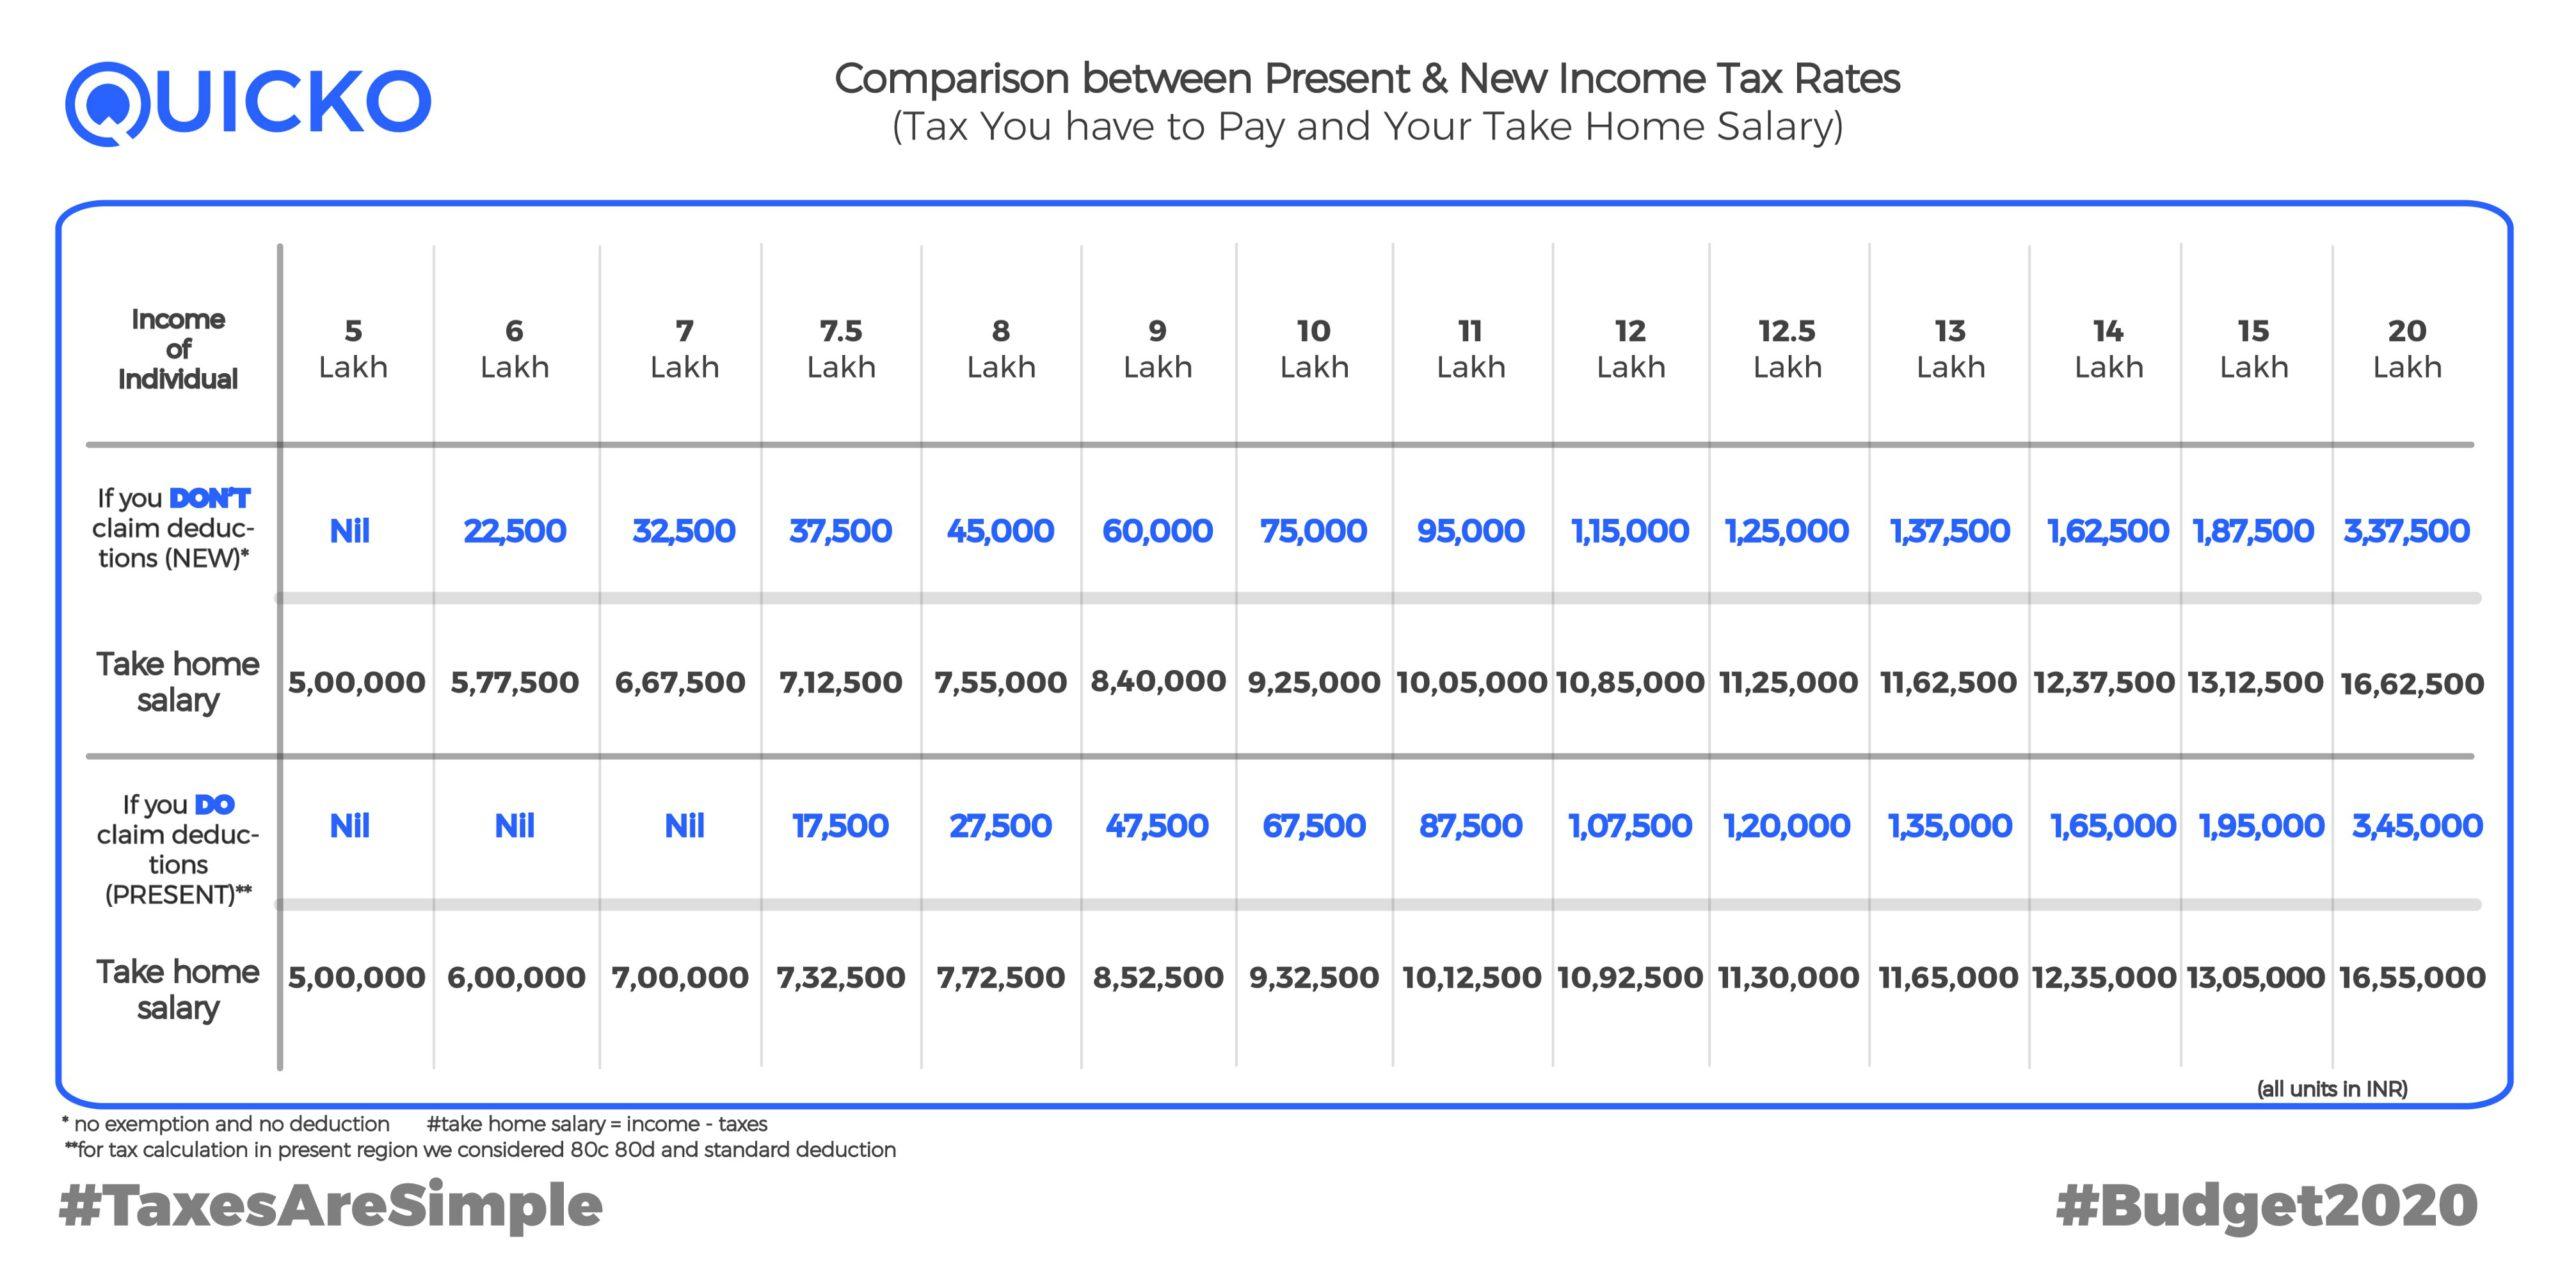 Old Vs New Tax Regime Comparison